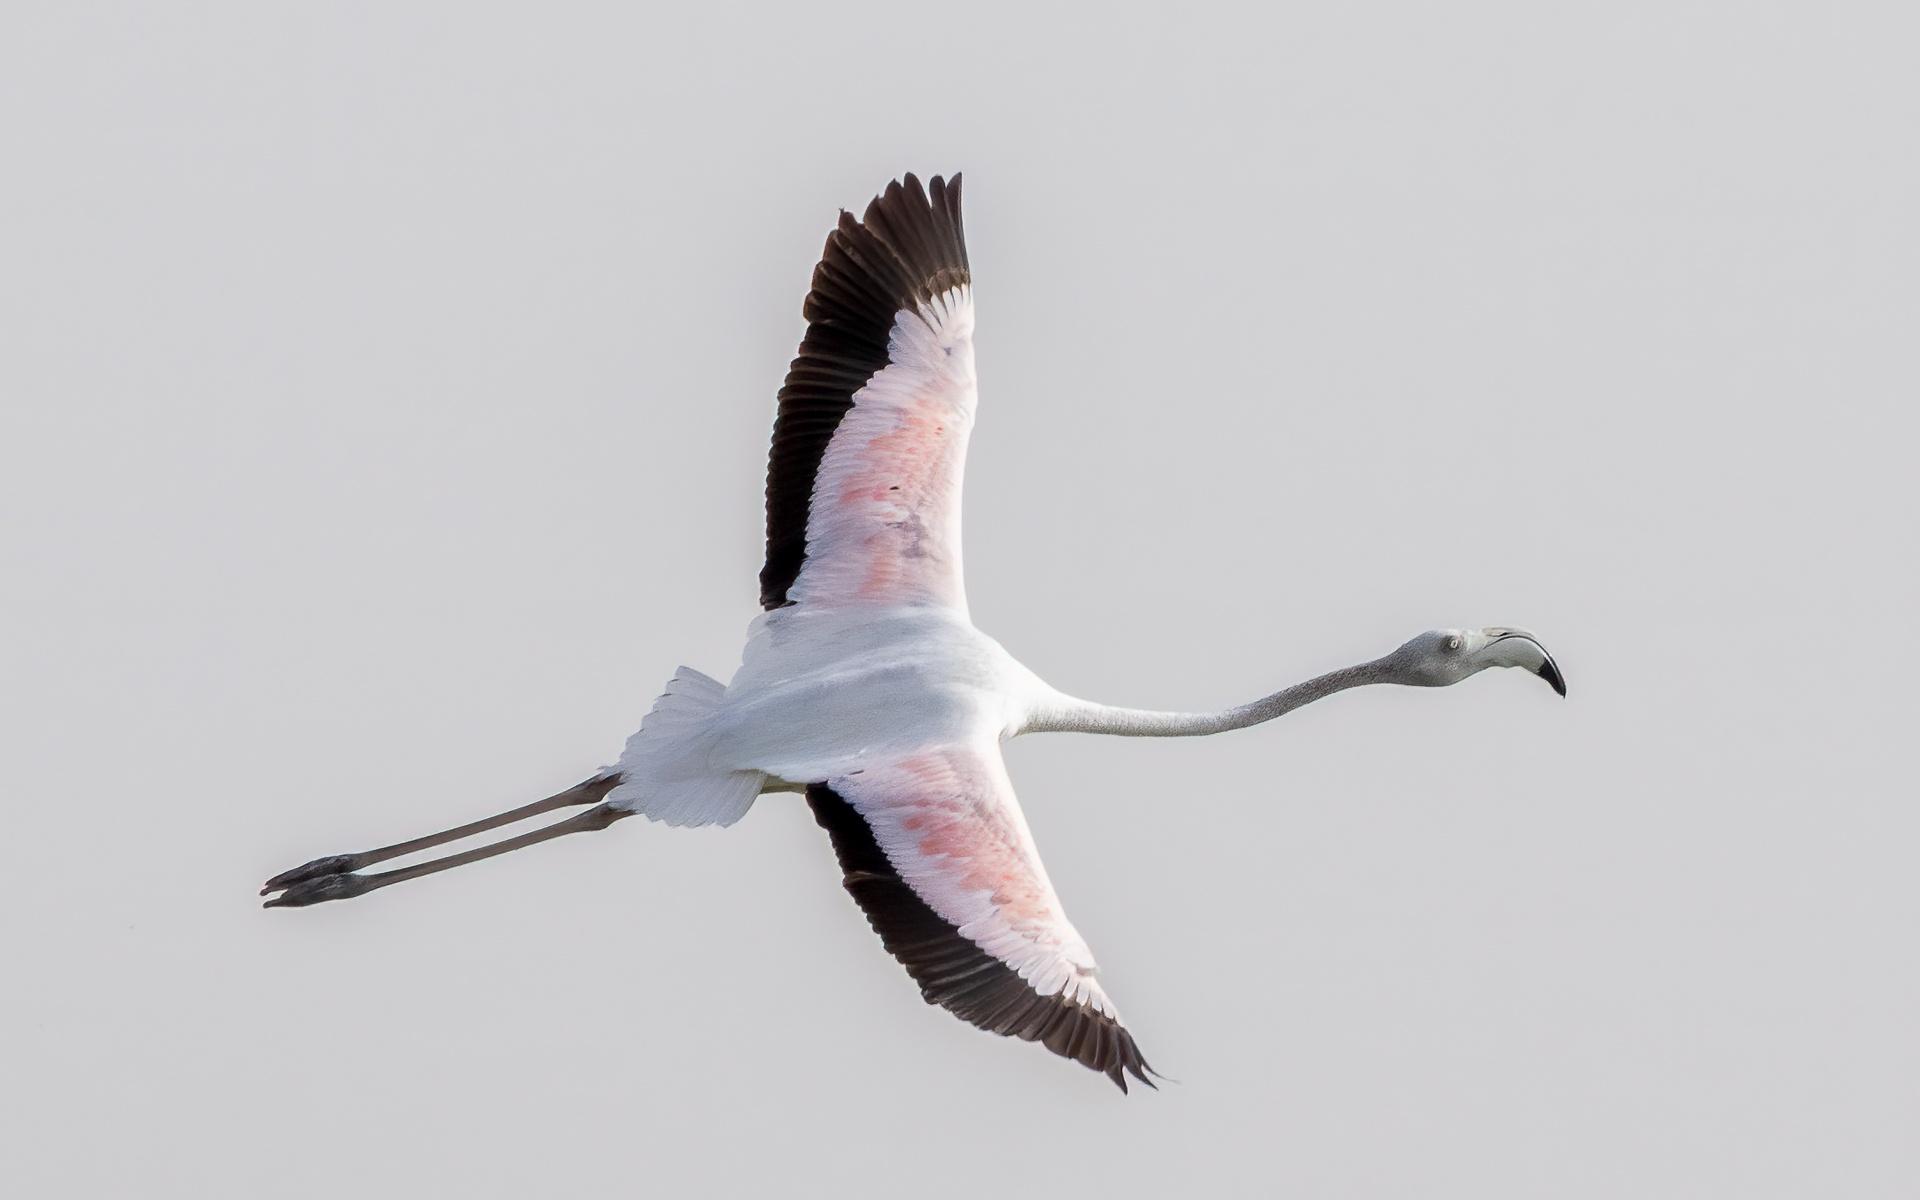 Flamingo soaring